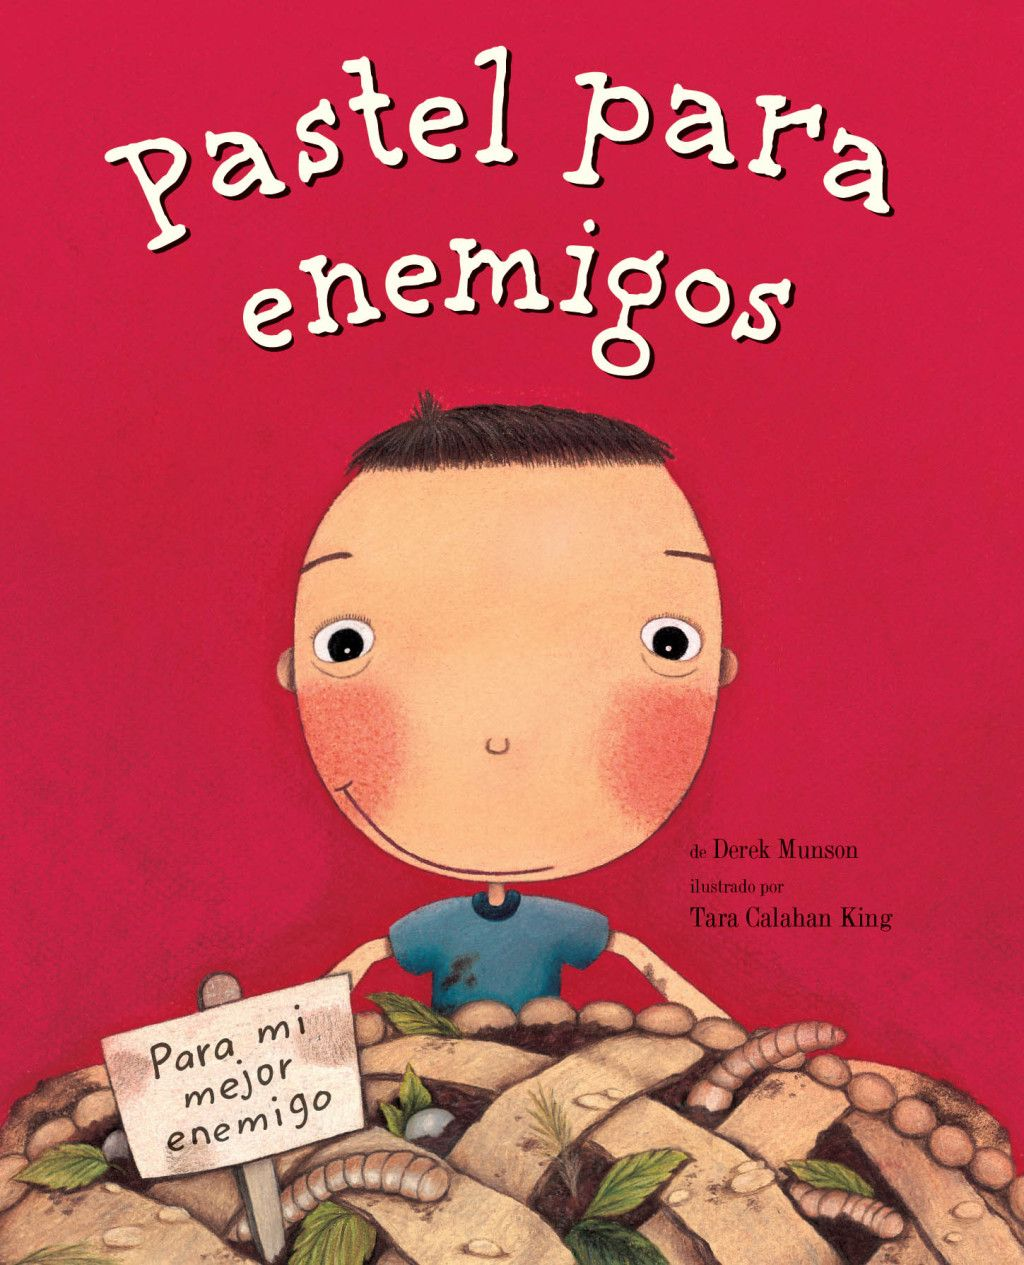 Pastel Para Enemigos Enemy Pie Spanish Language Edition